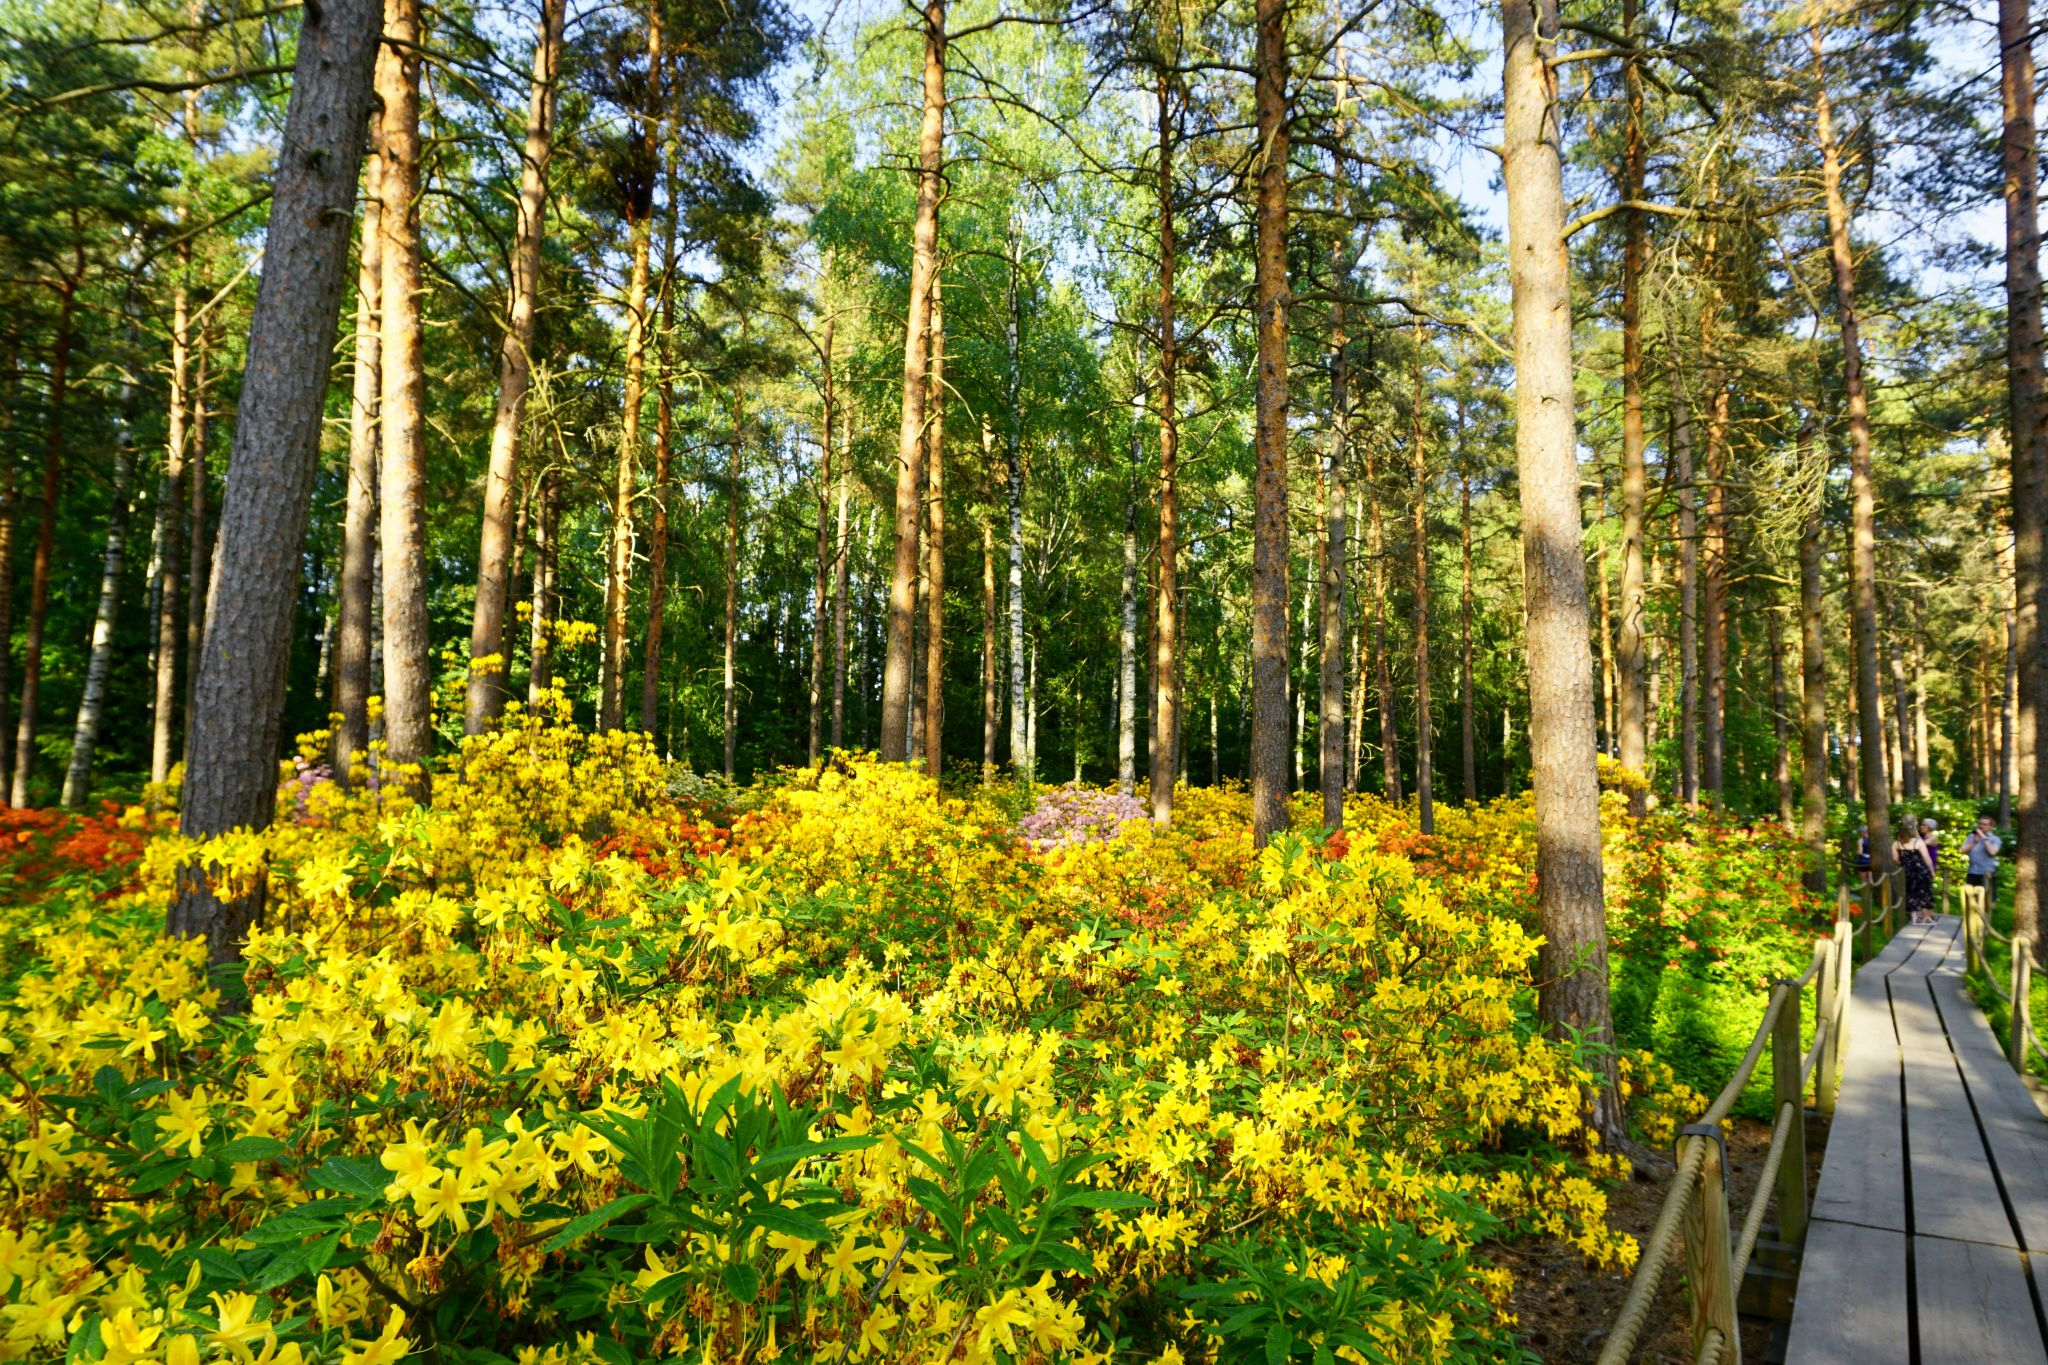 Yellow rhododendrons in Alppiruusupuisto